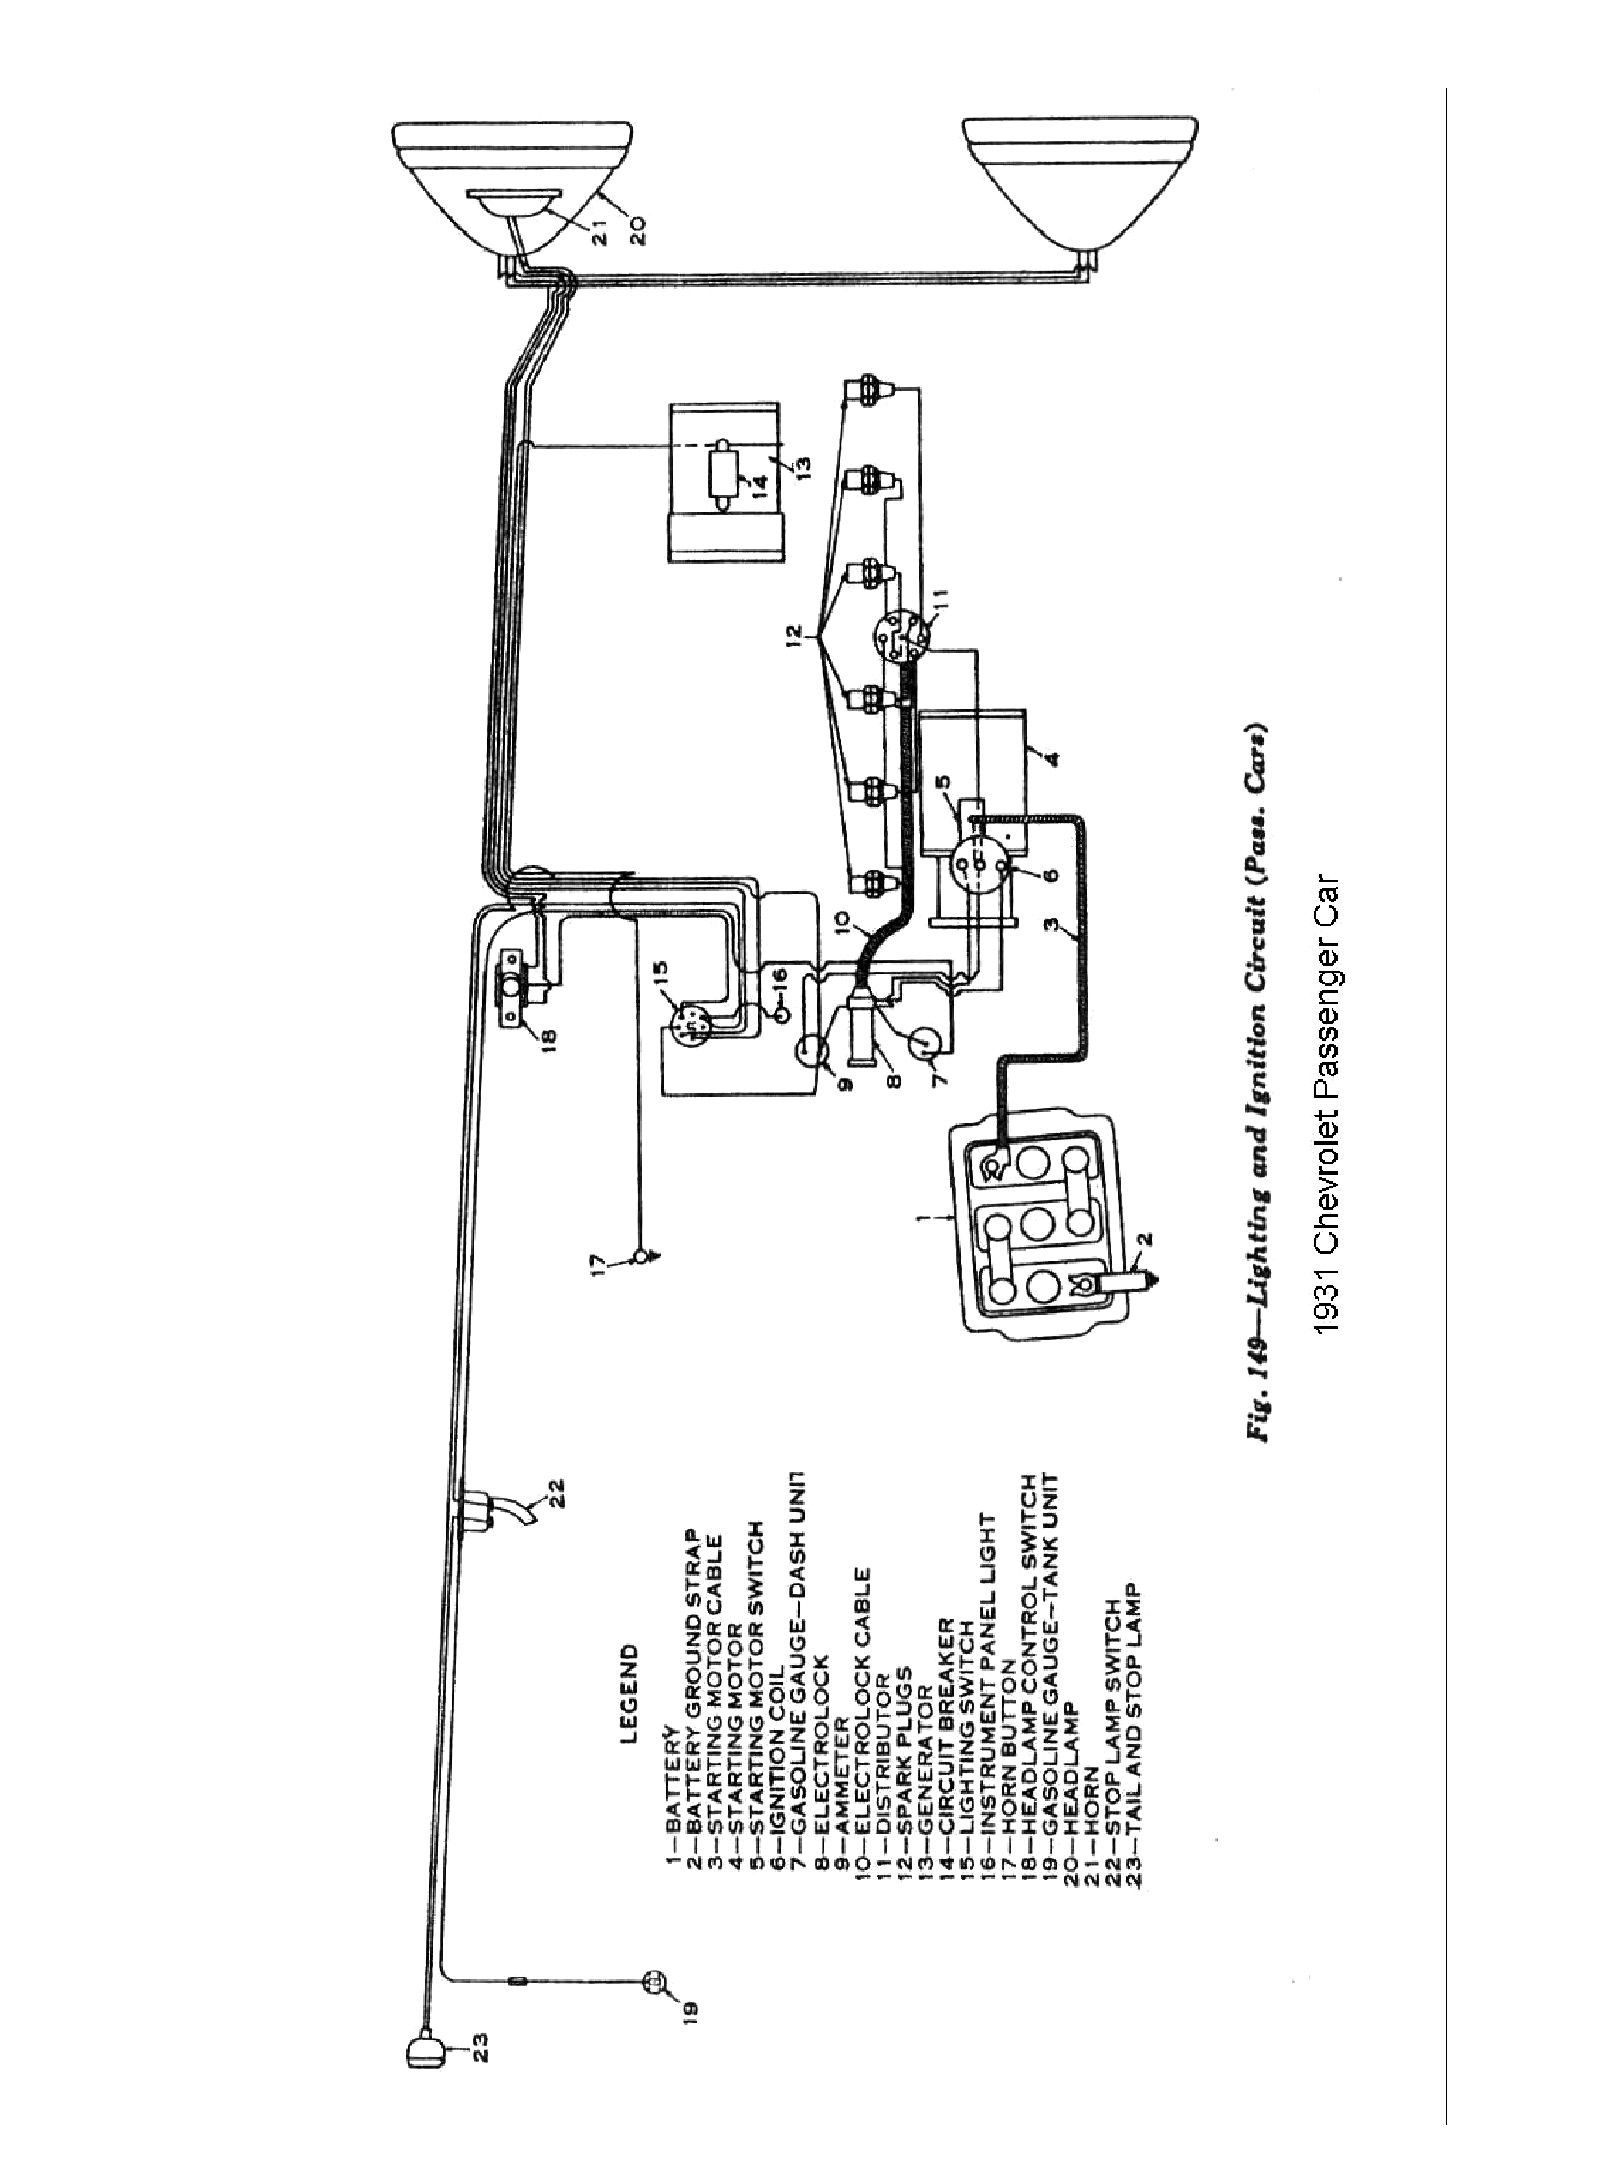 Diagram Com Pac Yacht Wiring Diagram Full Version Hd Quality Wiring Diagram Wiringbywayne2a Dante09 It